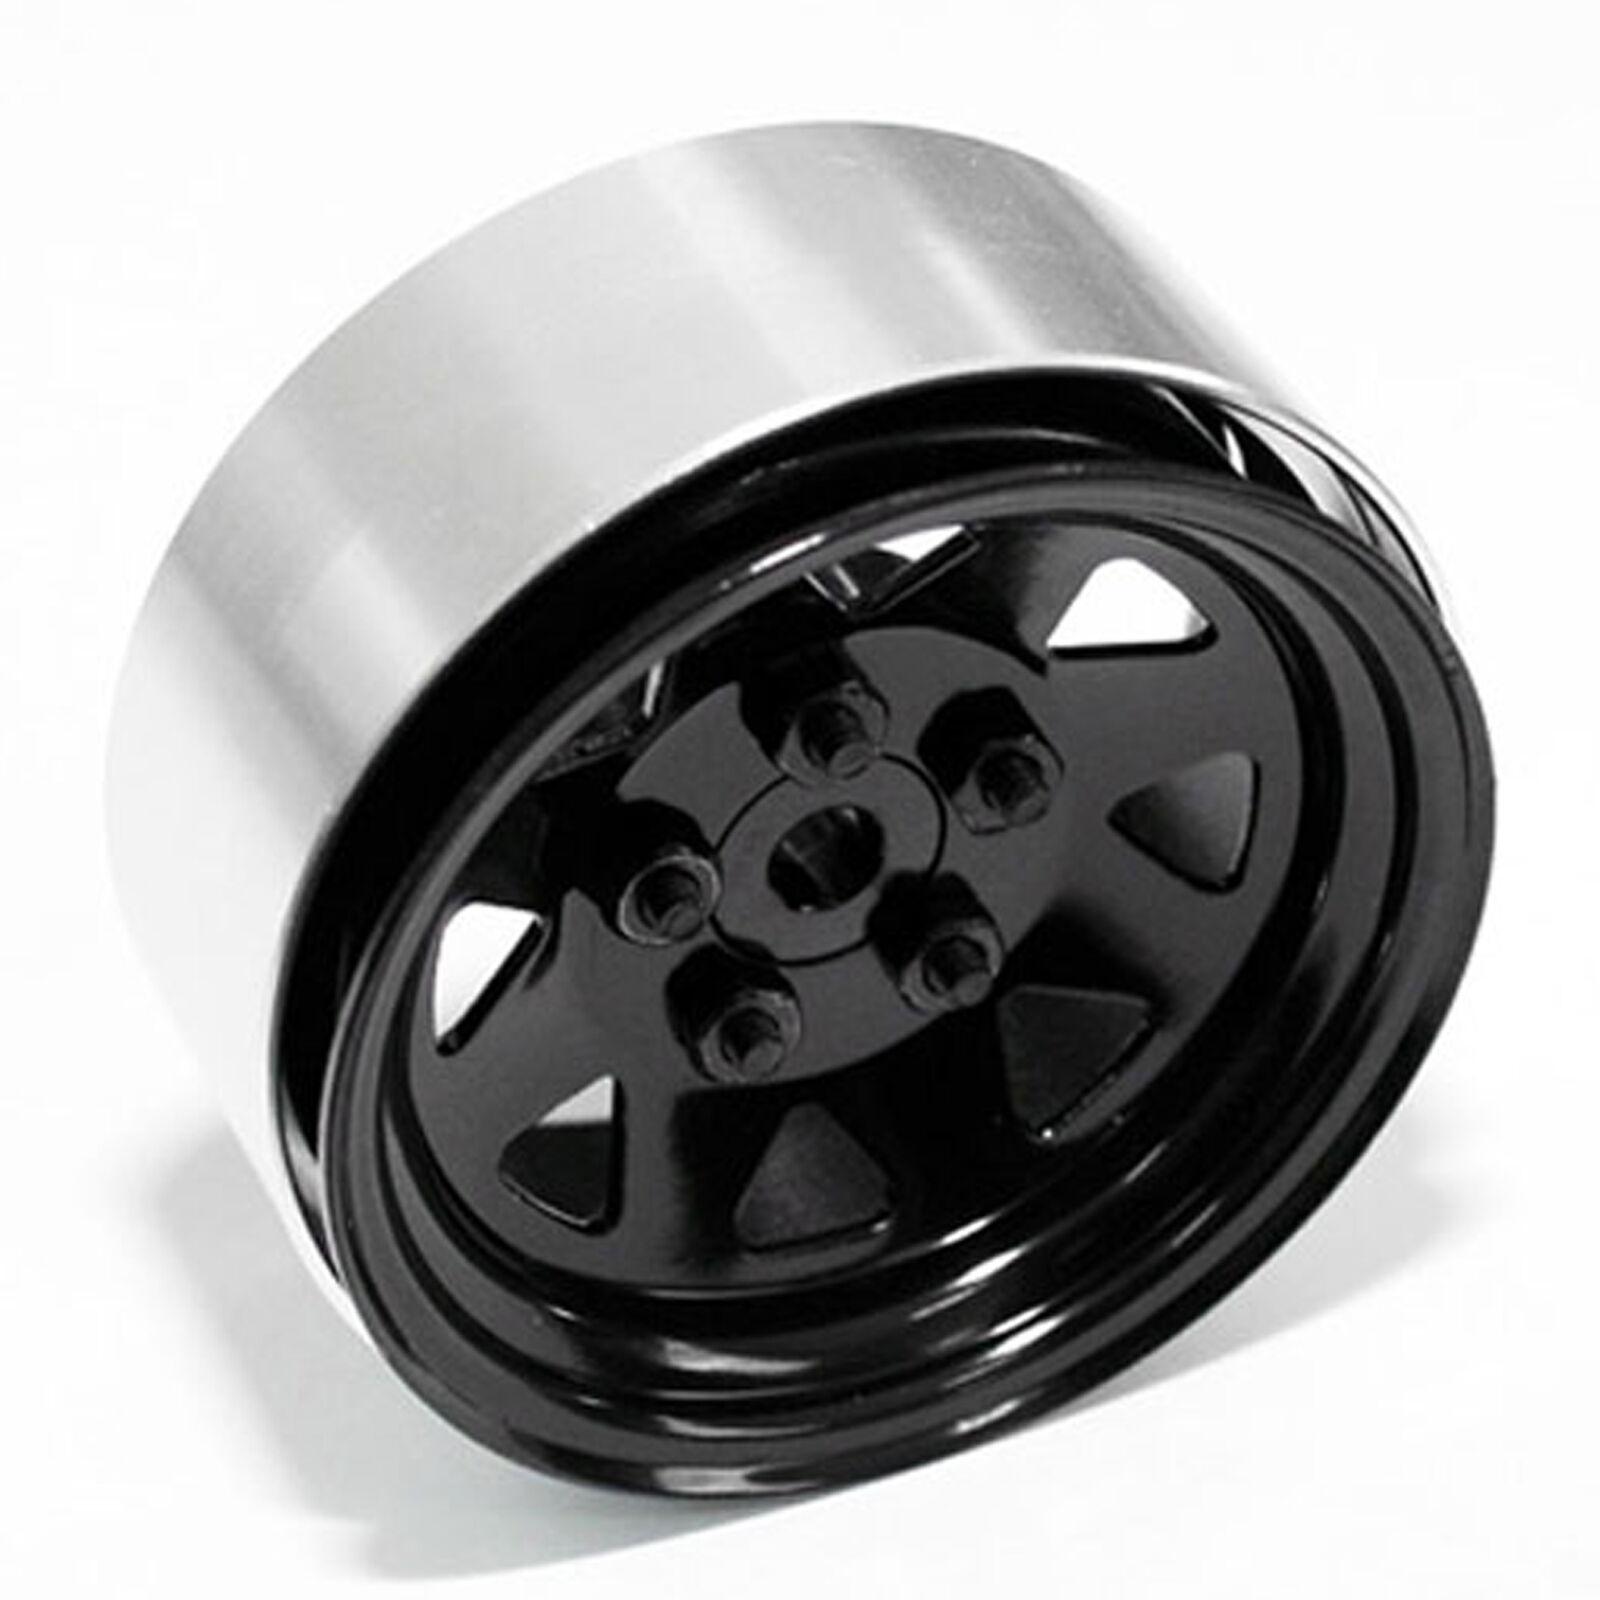 5 Lug Wagon 1.9 Stamped Beadlock Wheels, Black (2)